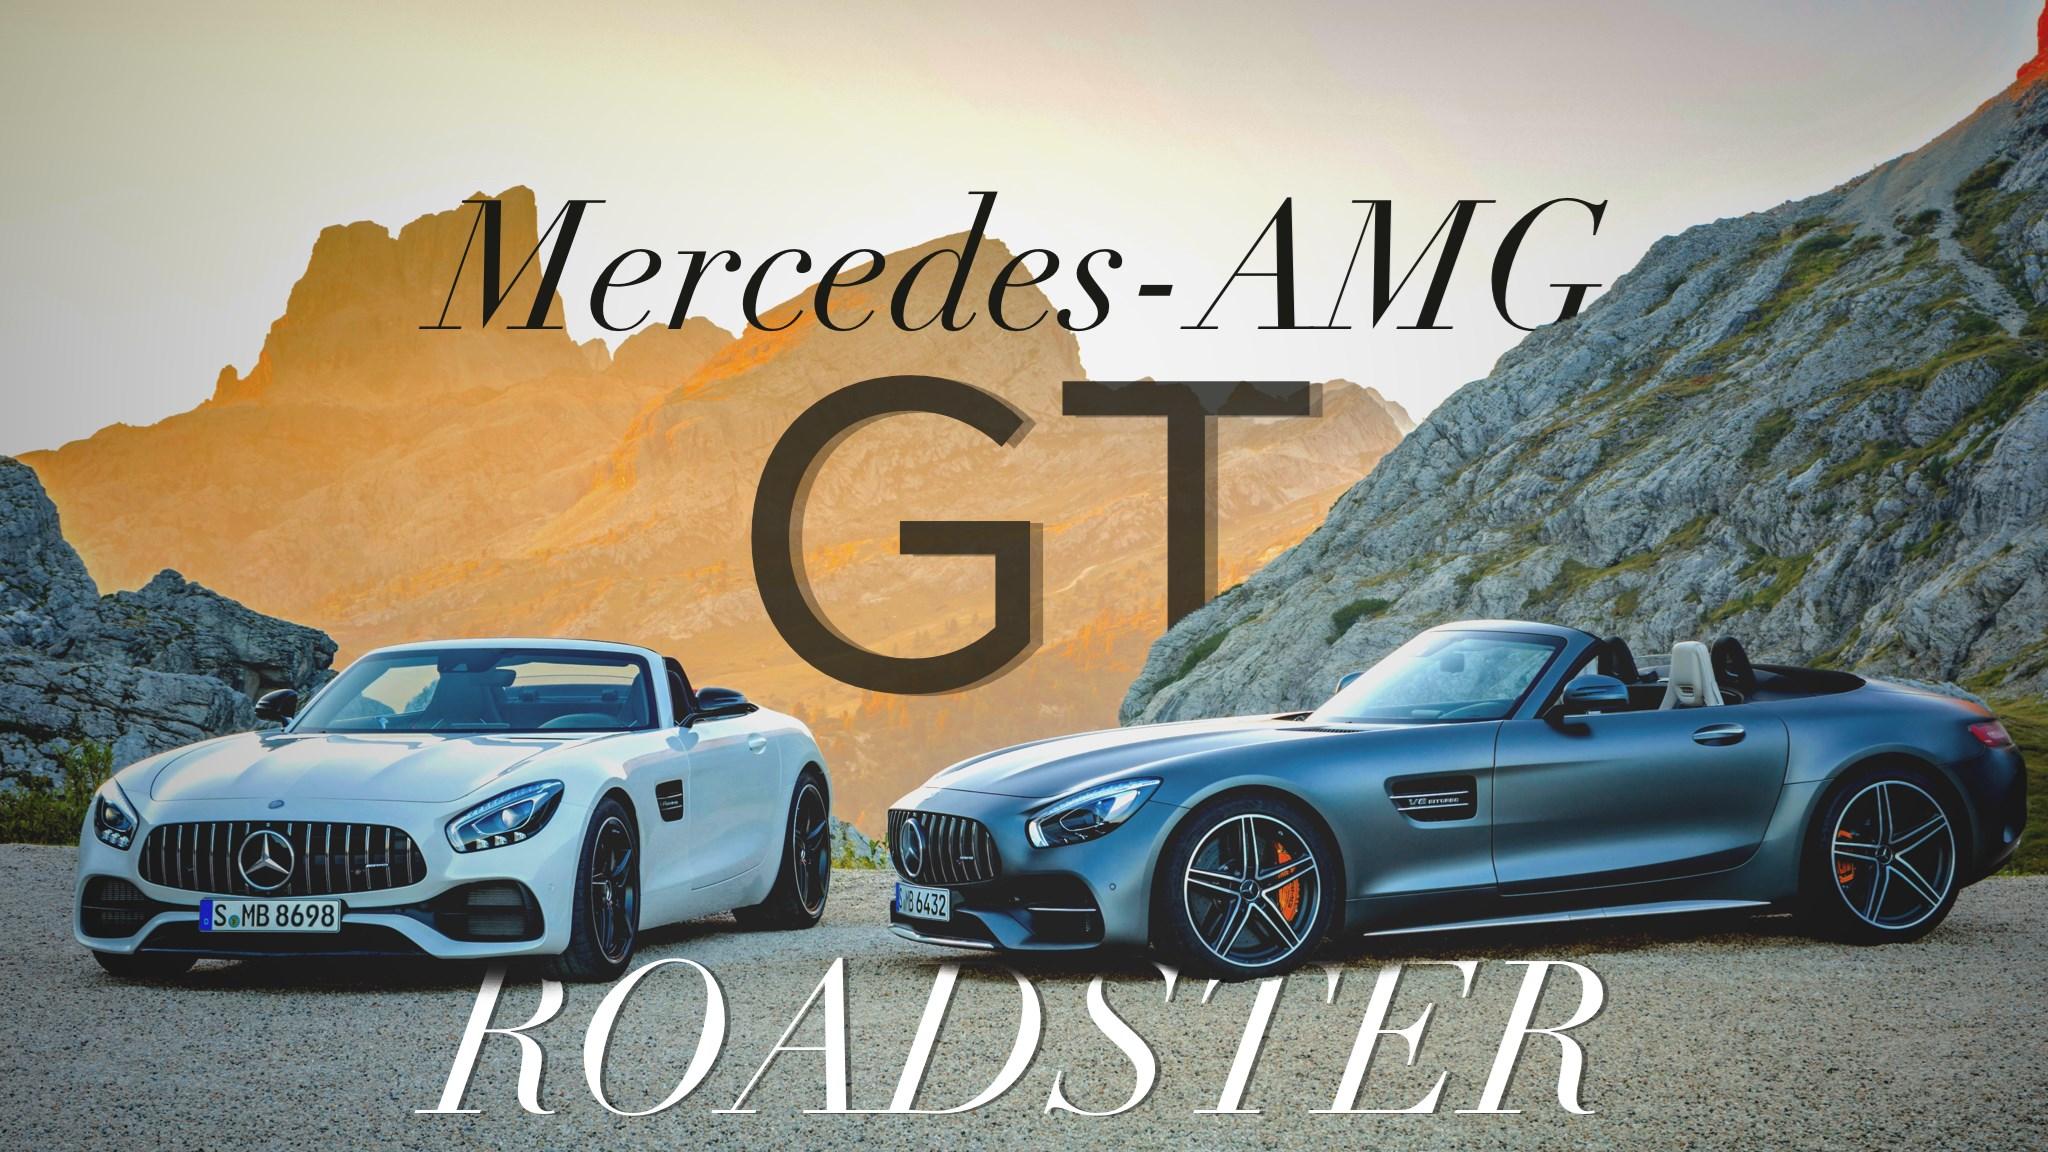 Mercedes-AMG GT, GT C Roadster Revealed Before Paris